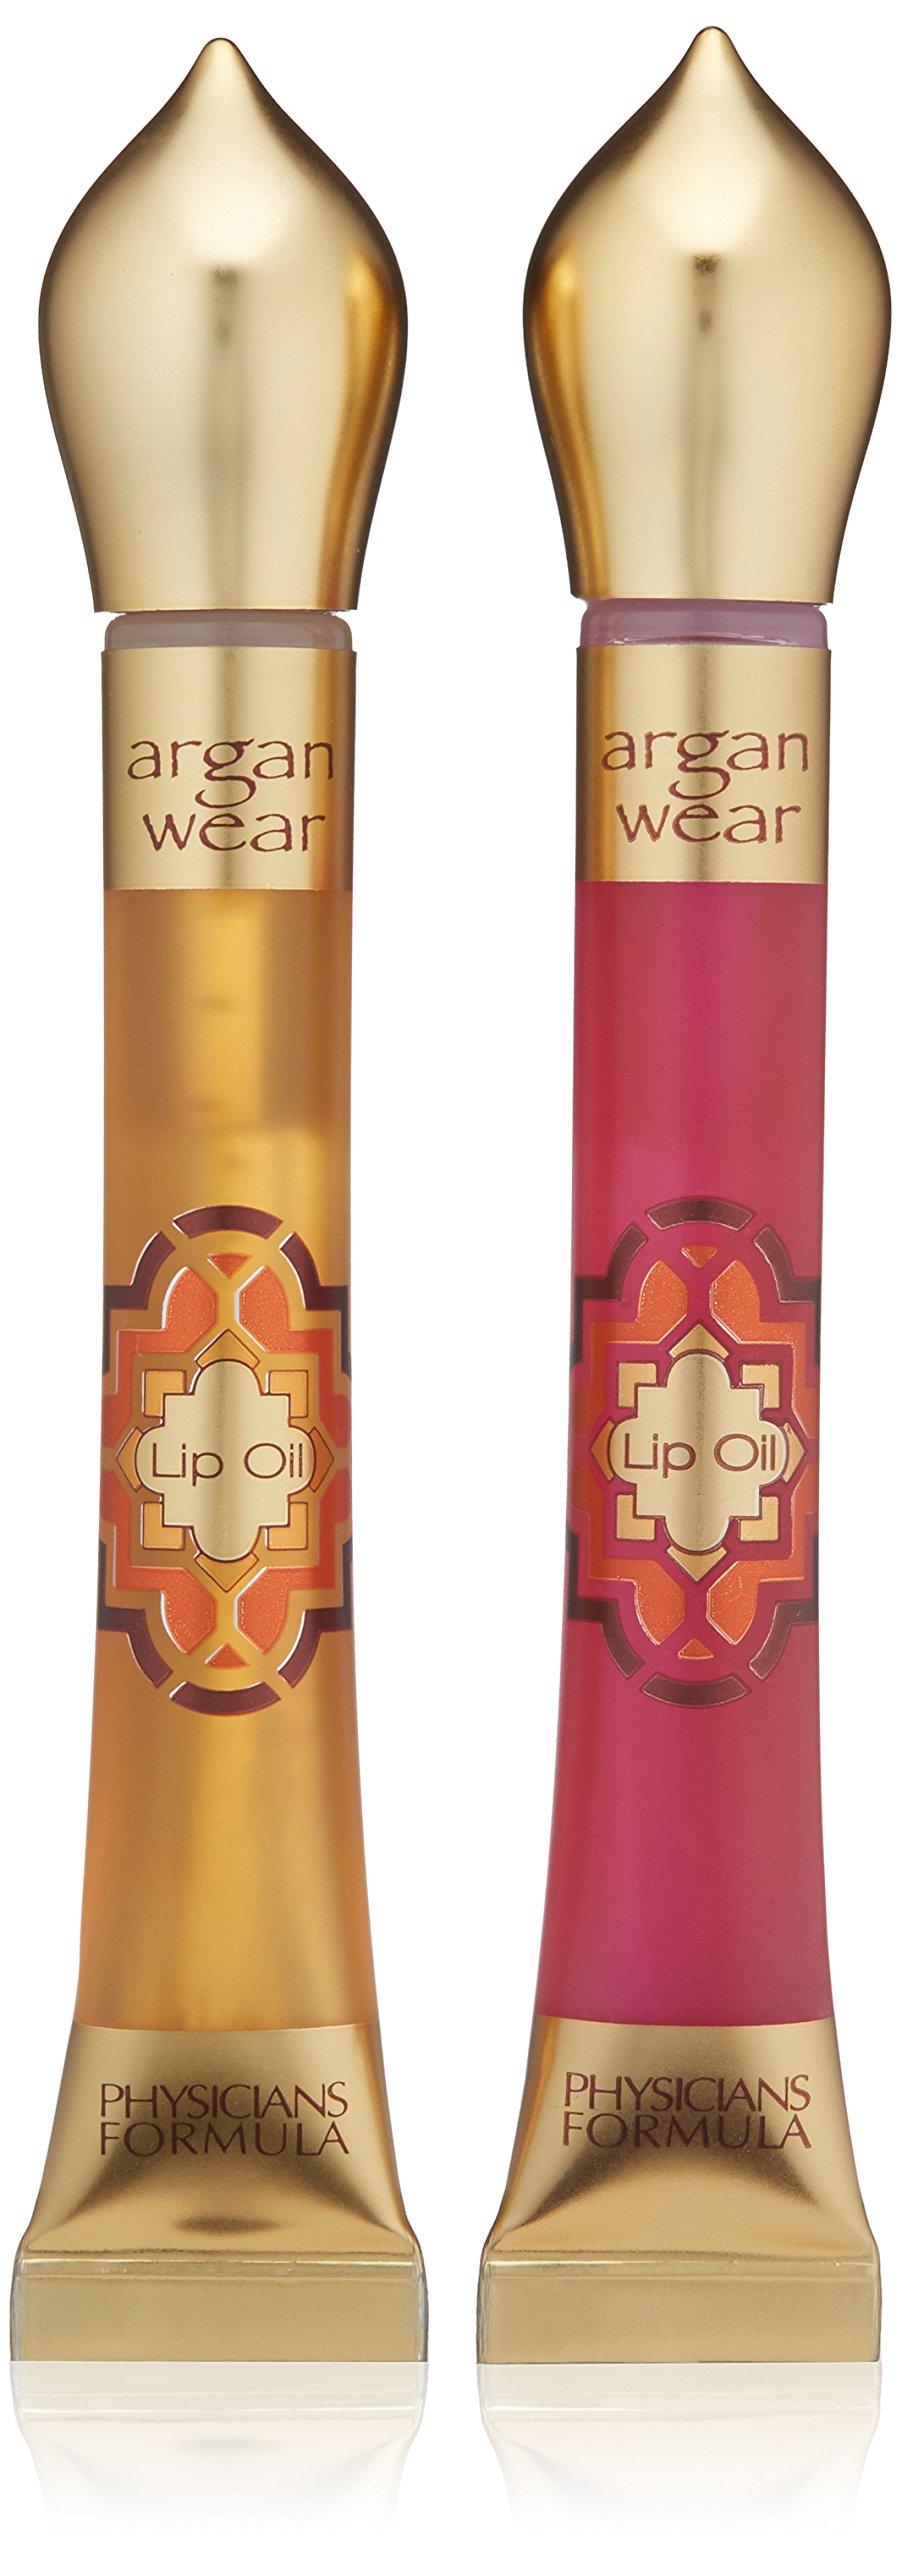 Physicians Formula Argan Wear Ultra-Nourishing Argan Lip Oil Duo, Liquid Gold/Pink, 0.6 Fluid Ounce